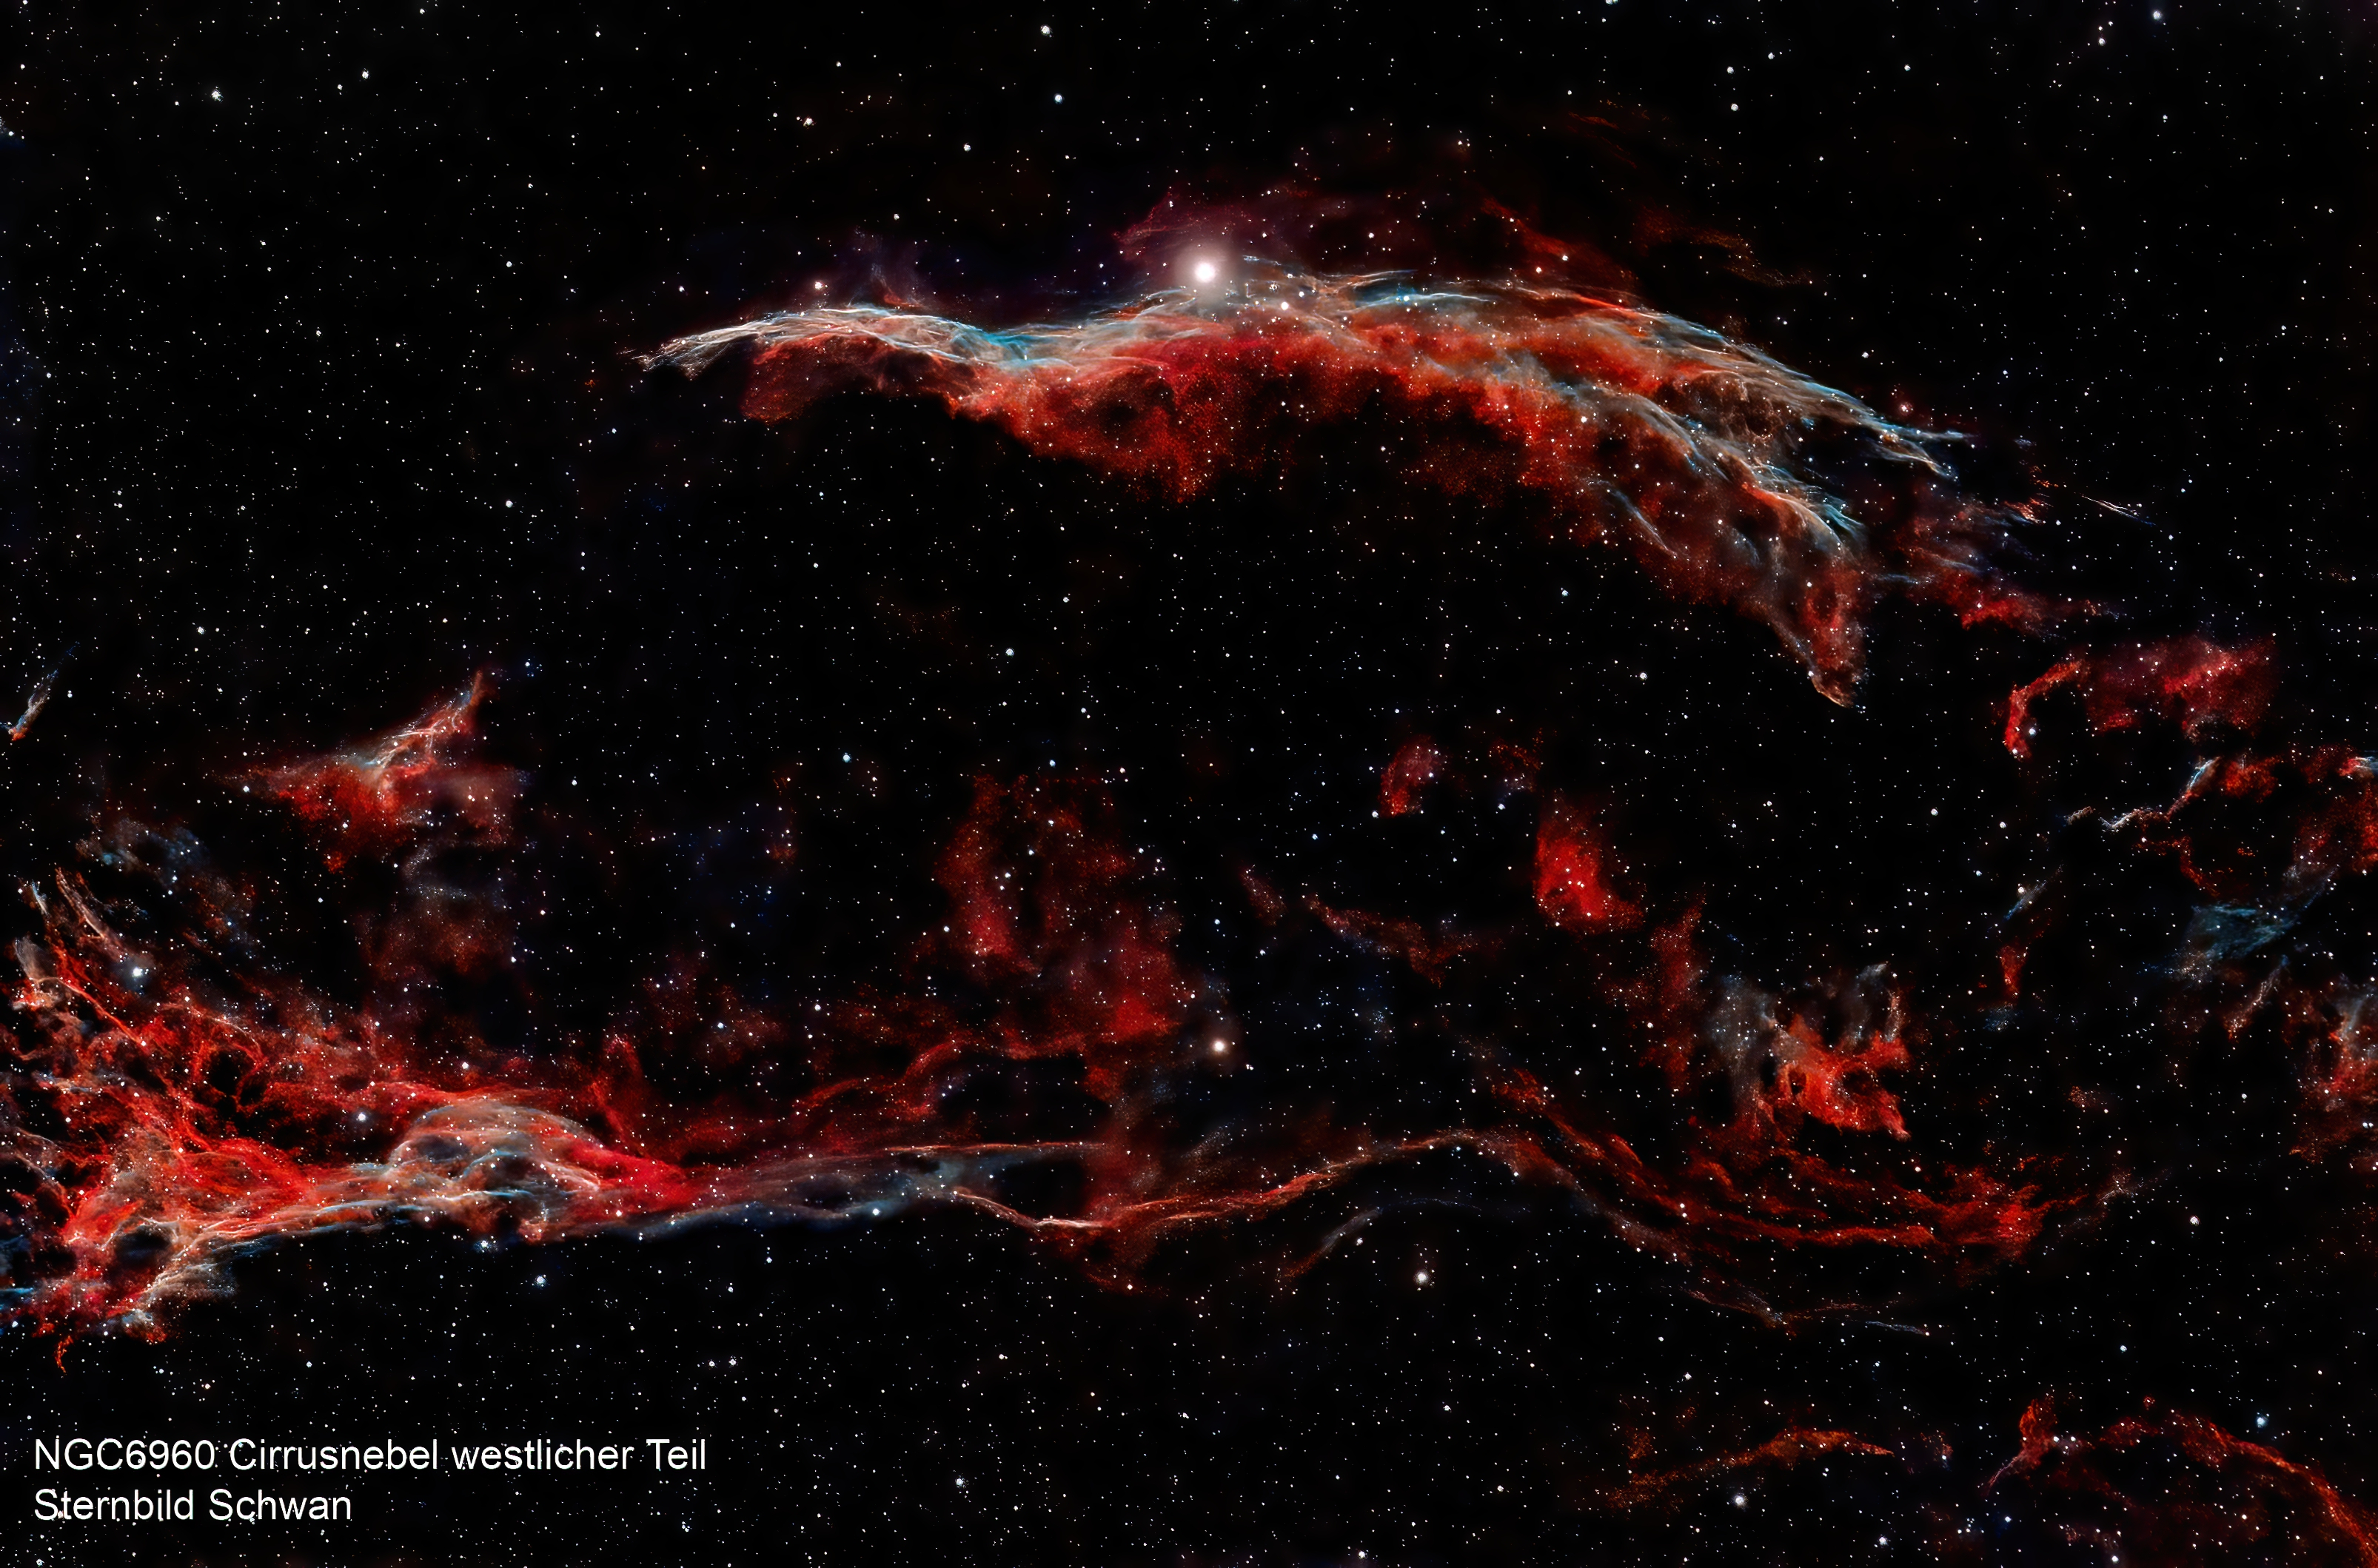 NGC 6960 Cirrusnebel